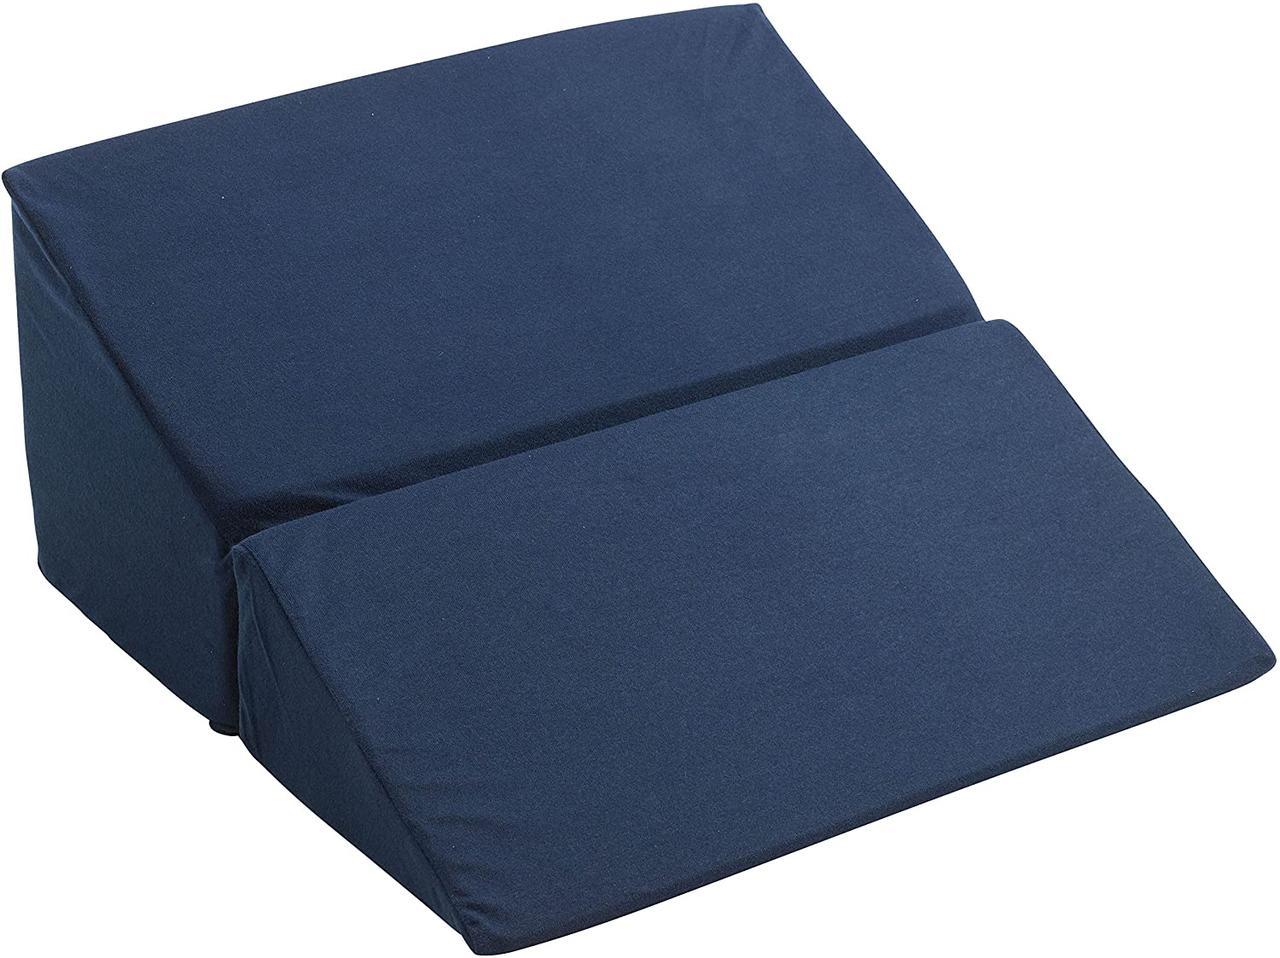 Подушка от рефлюкса, варикоза и т.д., складная Drive Medical, 25 см x 58 см x 58 см